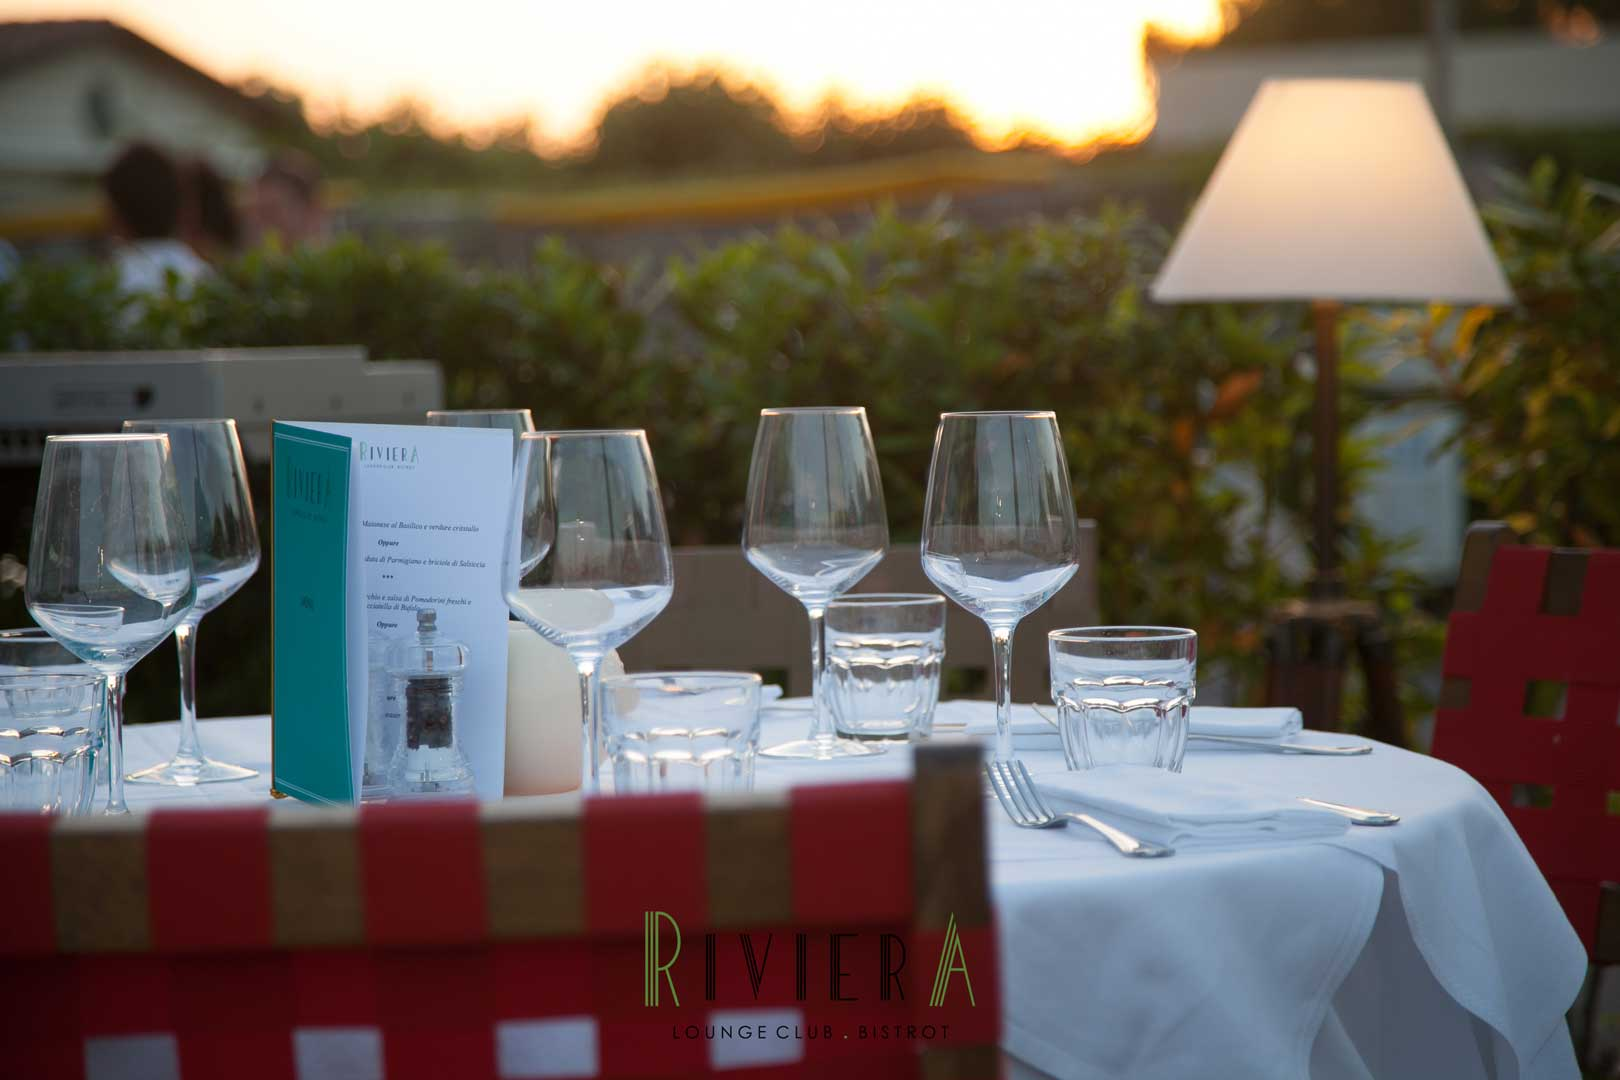 Riviera Lounge Club Bistrot - Forte dei Marmi